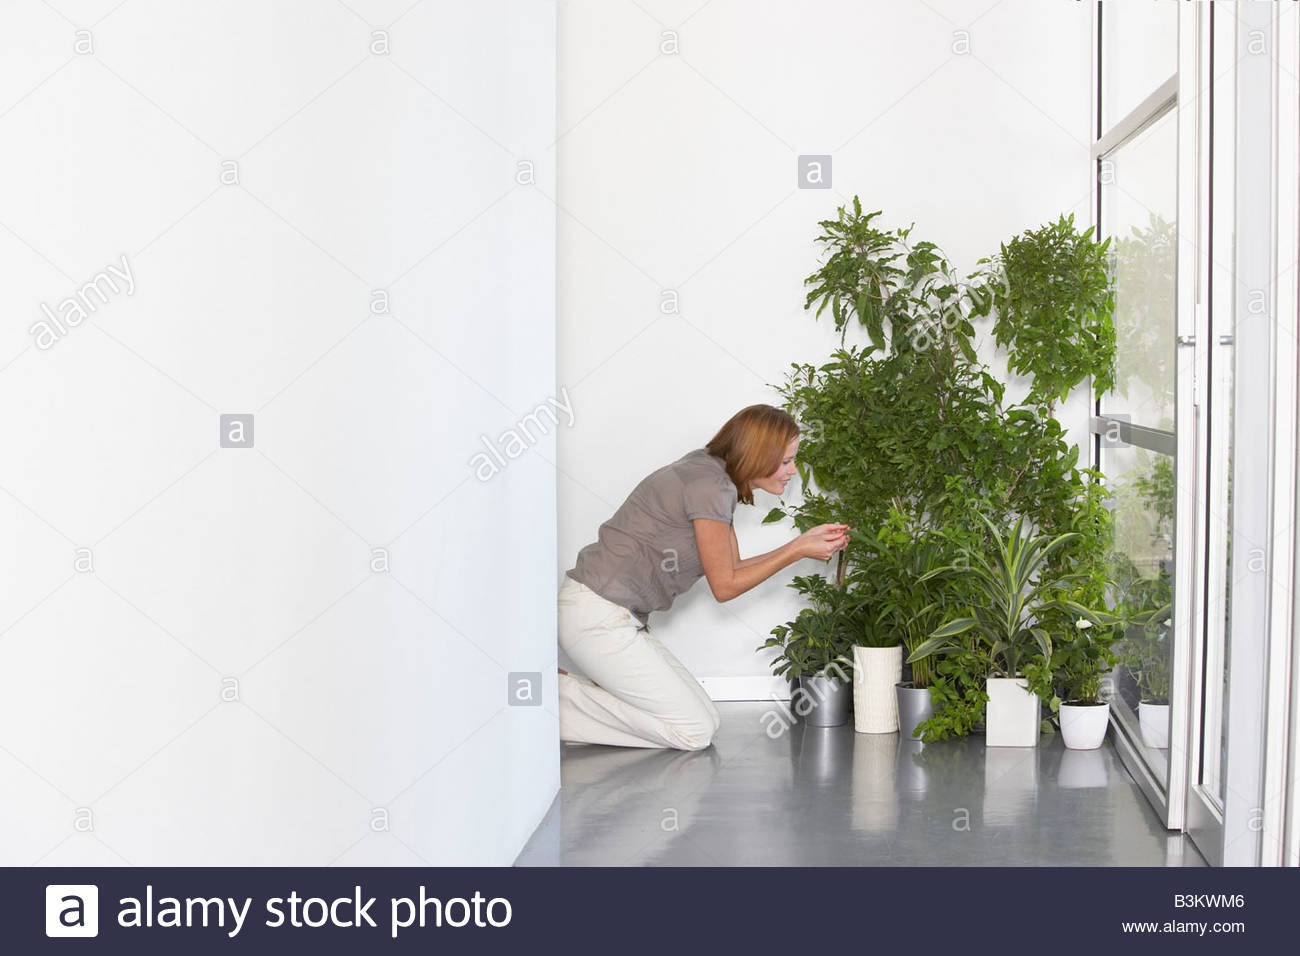 Businesswoman tending plants in office - Stock Image